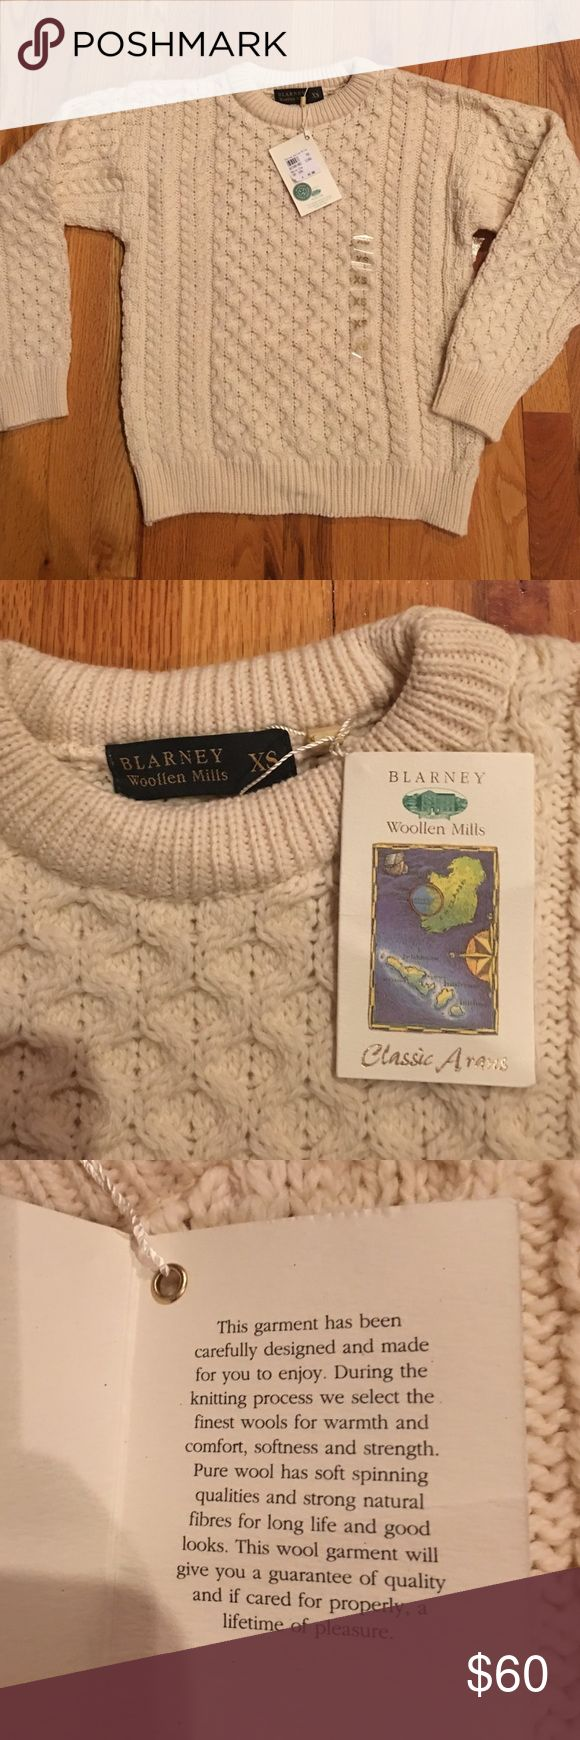 NWT women's extra small Irish sweater GORGEOUS! New with tags's women's extra small Irish sweater from the Blarney Woollen Mills in Ireland. Blarney Woollen Mills Sweaters Crew & Scoop Necks